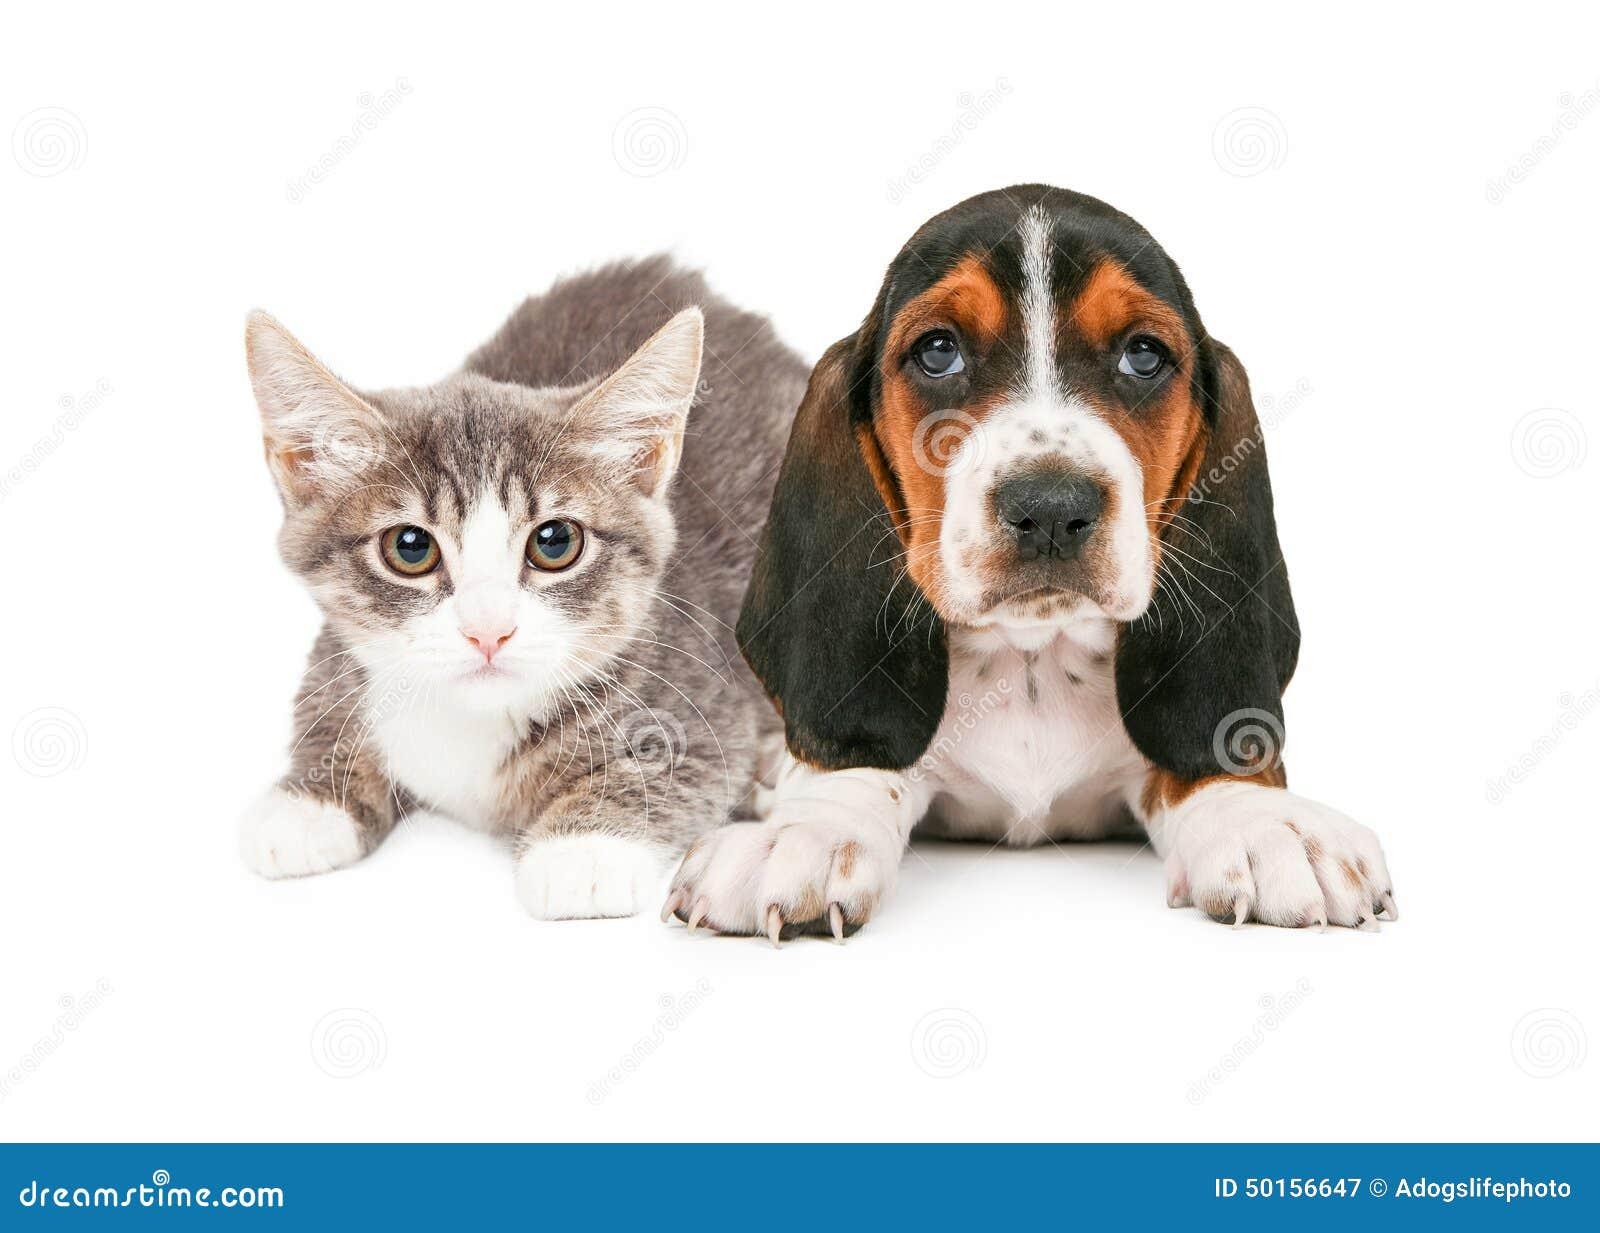 Basset Hound Puppy And Kitten Stock Photo - Image: 50156647